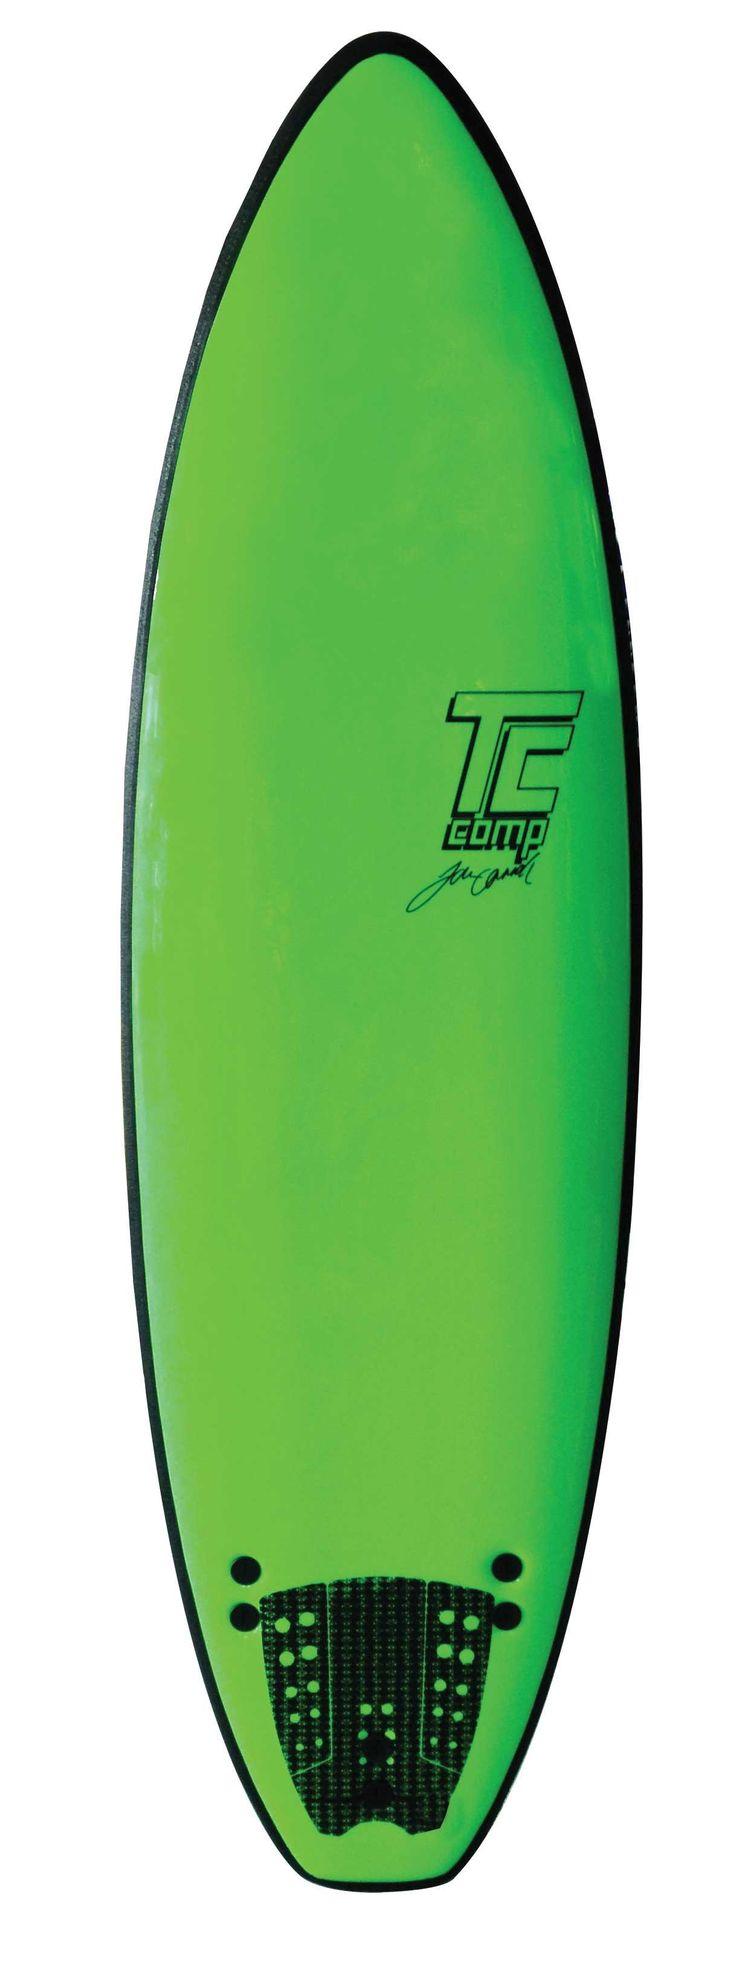 SOFTECH SOFT SURFBOARD Tom Carroll DSS Comp Thruster - 6'6 Your Local Bodyboard Shop - Australia & Worldwide